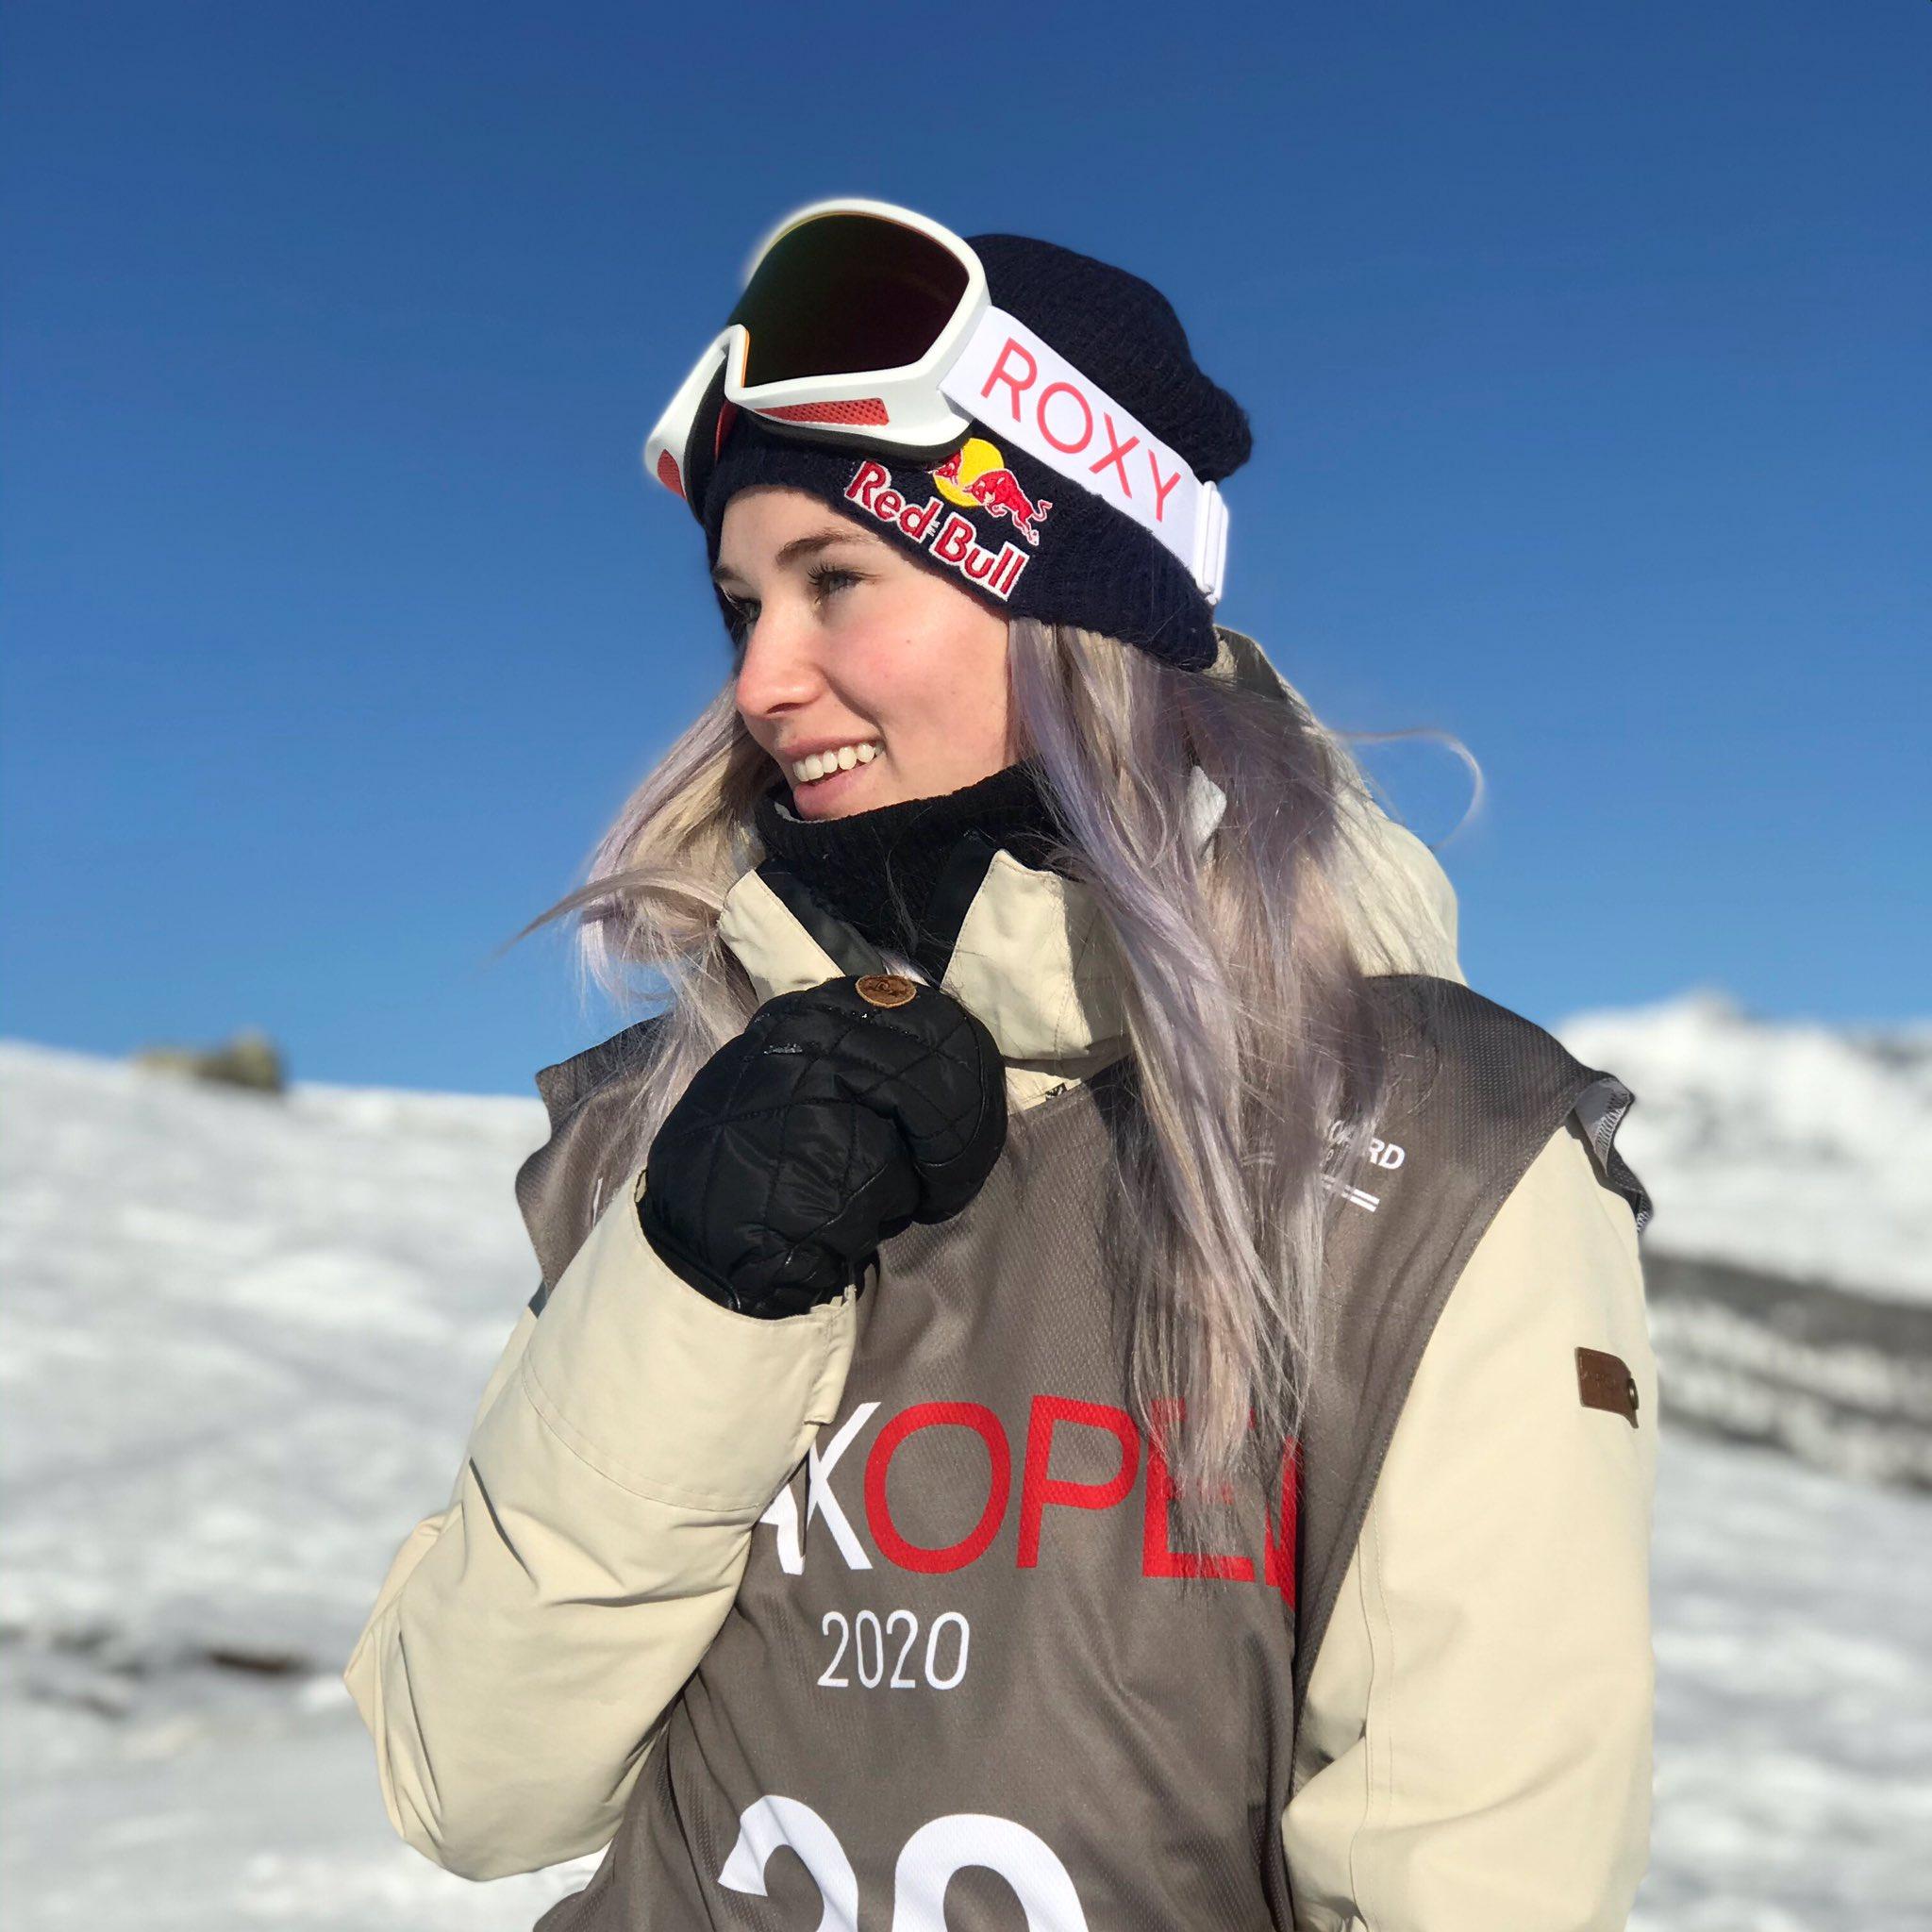 Britain's Katie Ormerod wins slopestyle bronze at Laax Open World Cup event in Switzerland